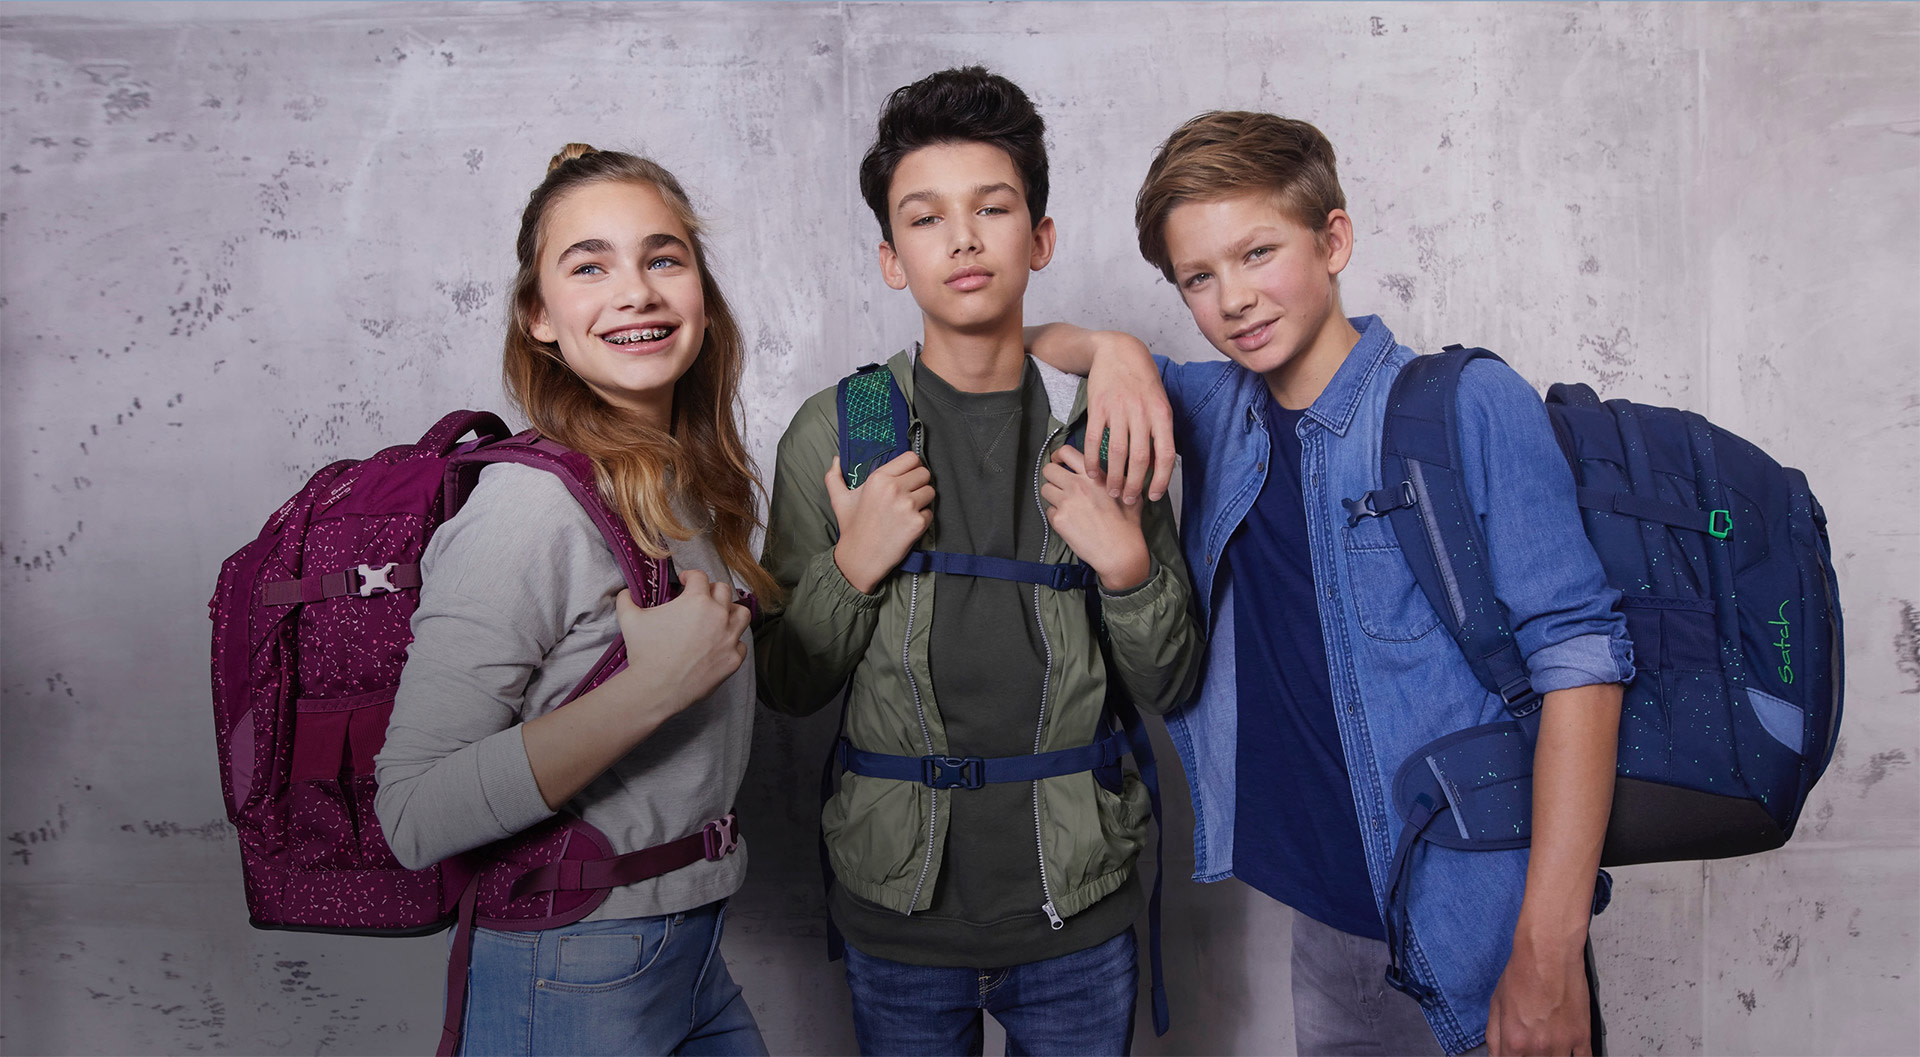 5a89954a0bb32 satch Schulrucksäcke - coole Rucksäcke für Schule   Freizeit